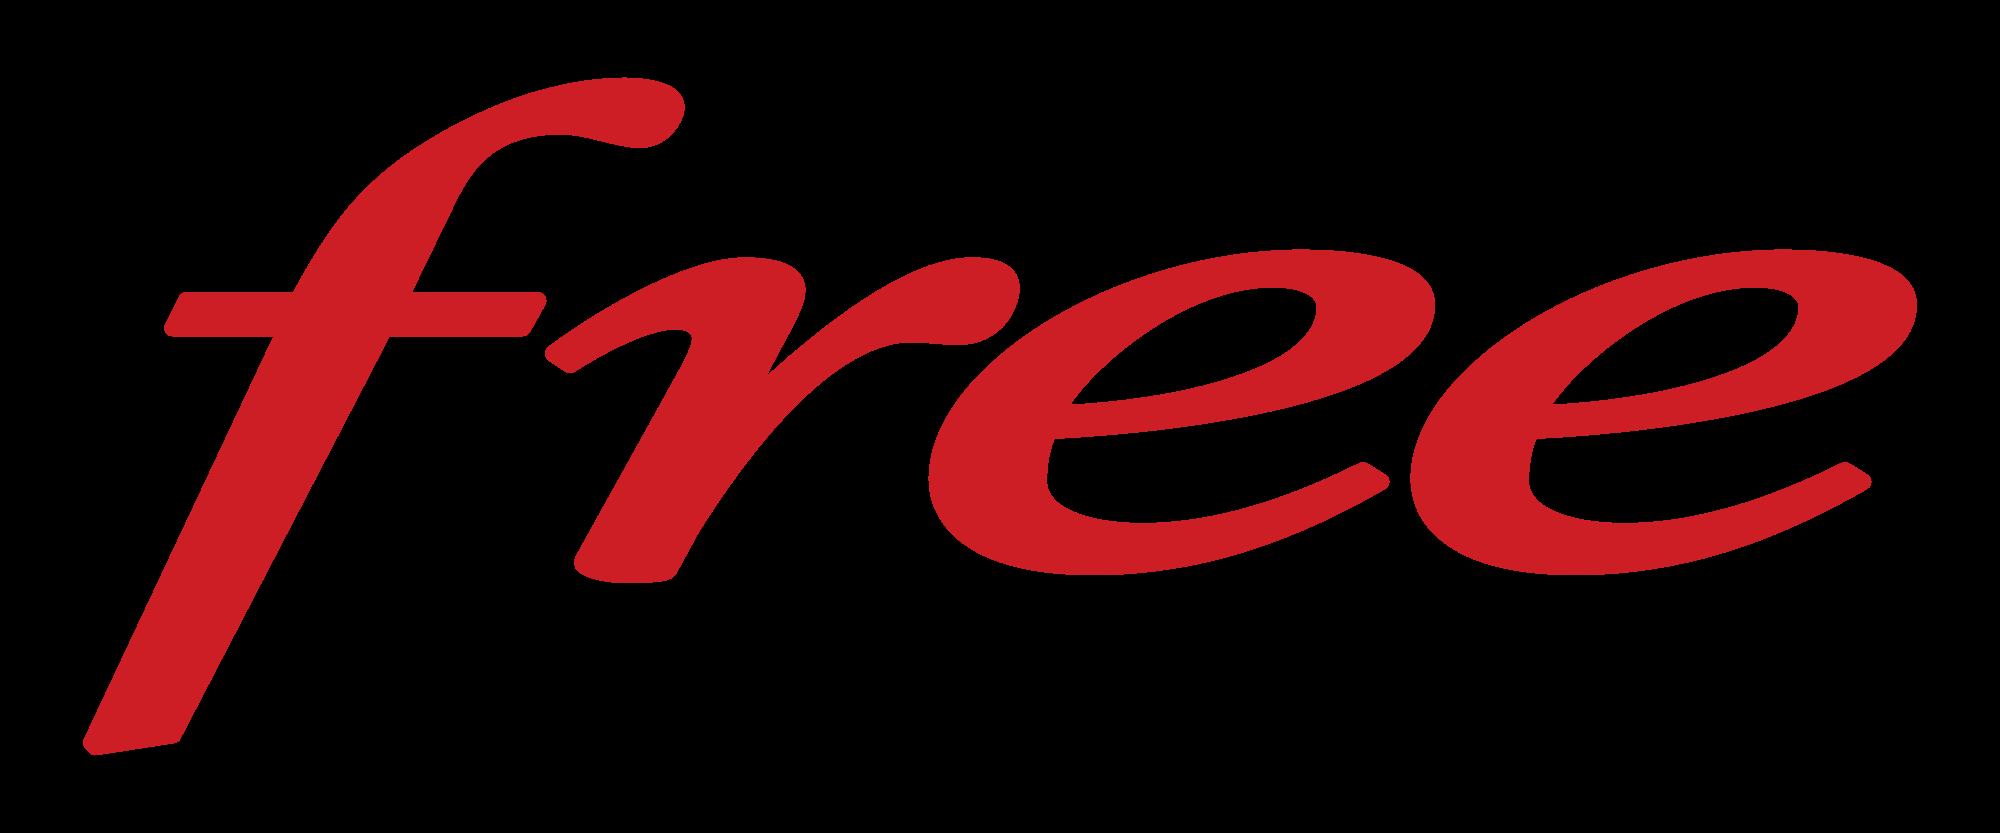 2000px Free logo svg